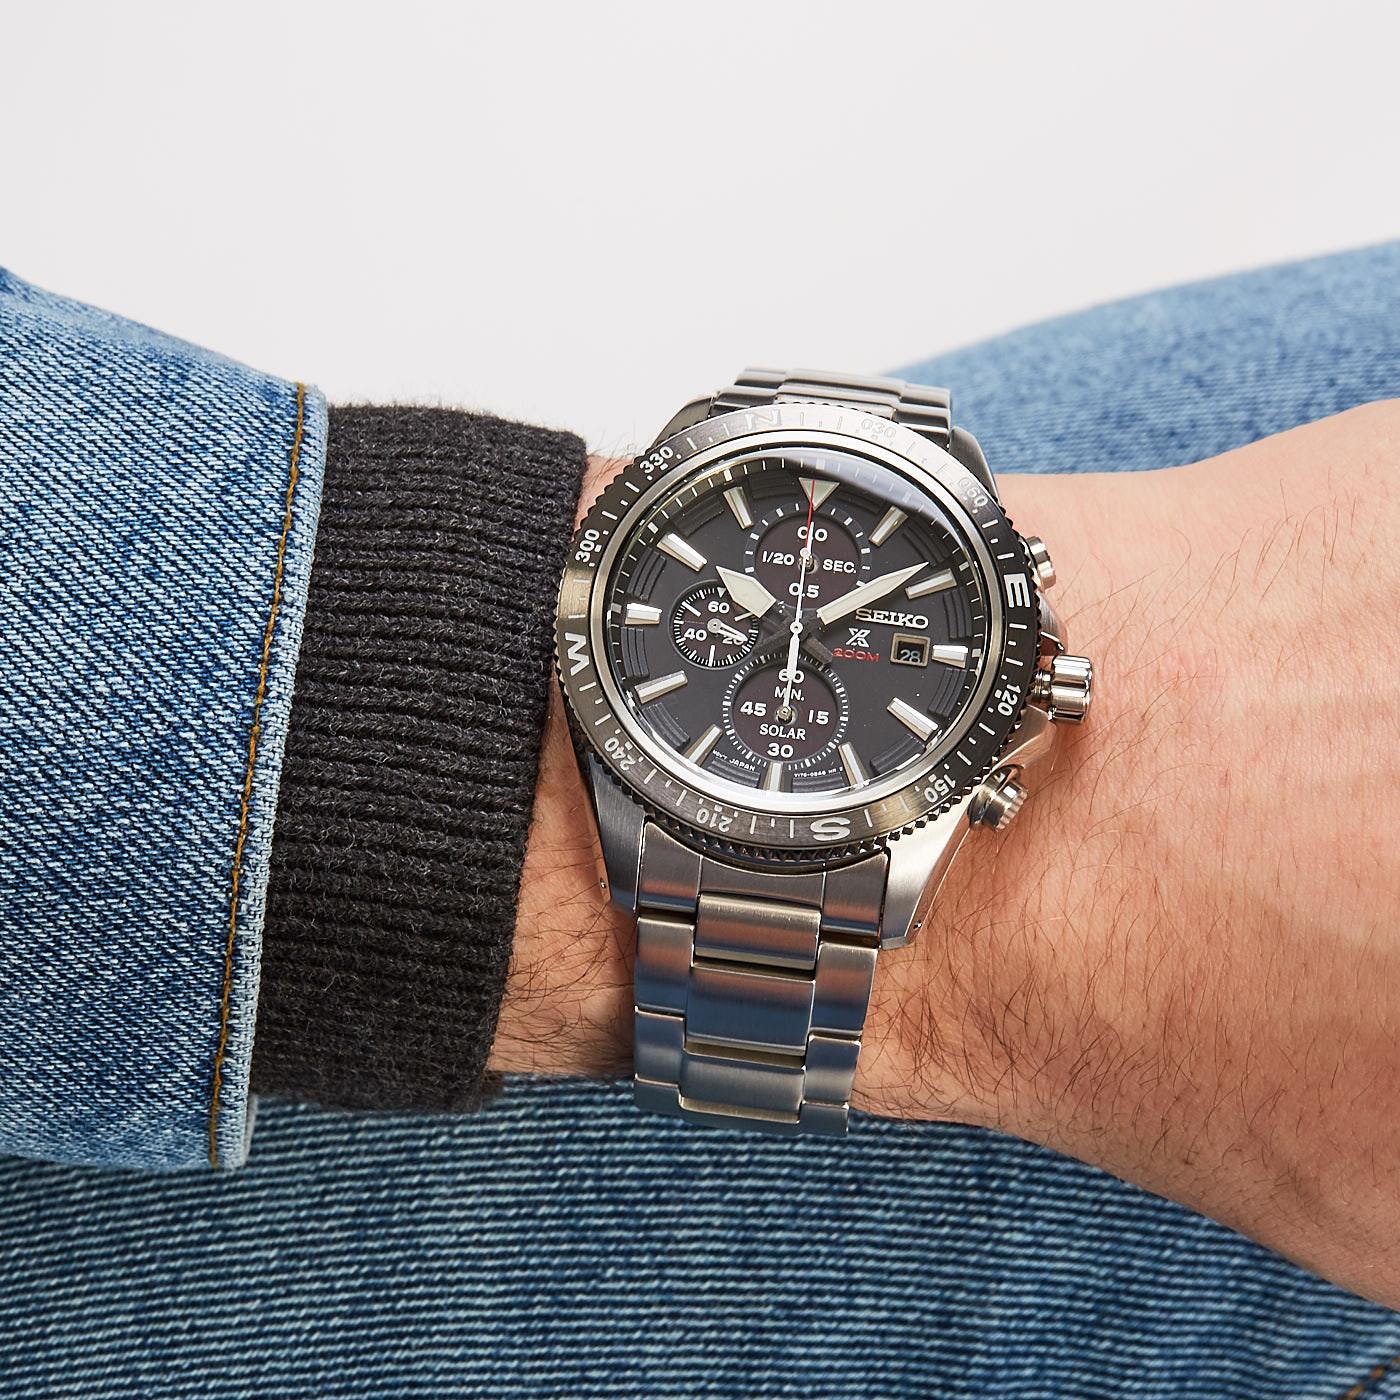 4314c8c8bf0d Seiko Prospex reloj SSC705P1 - Relojes